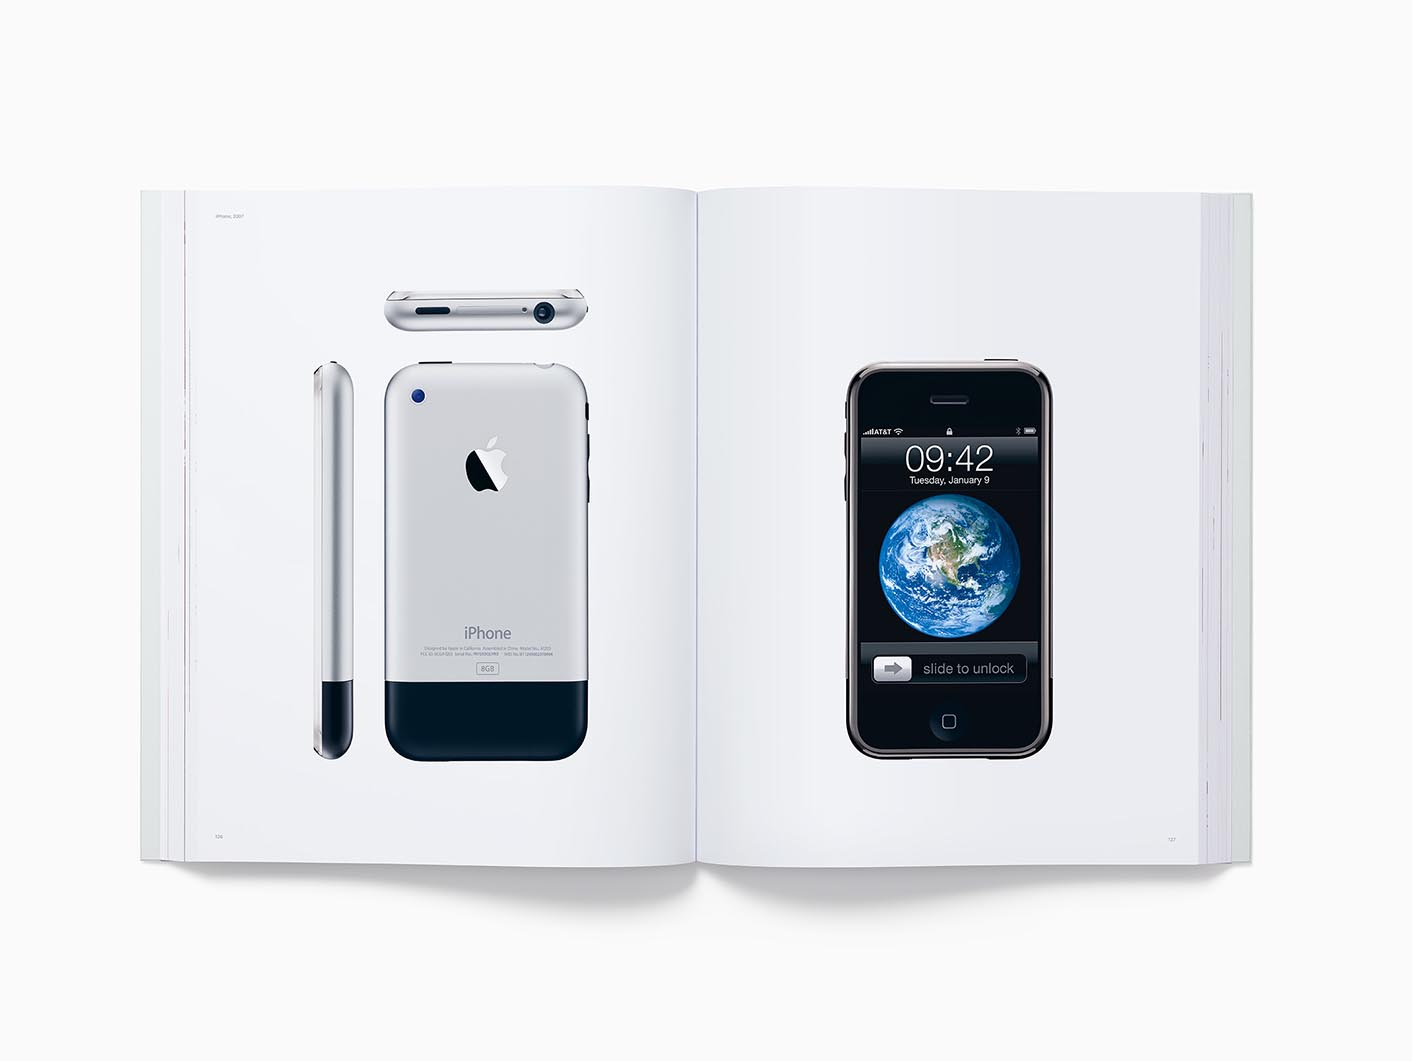 Designed by Apple in California livre